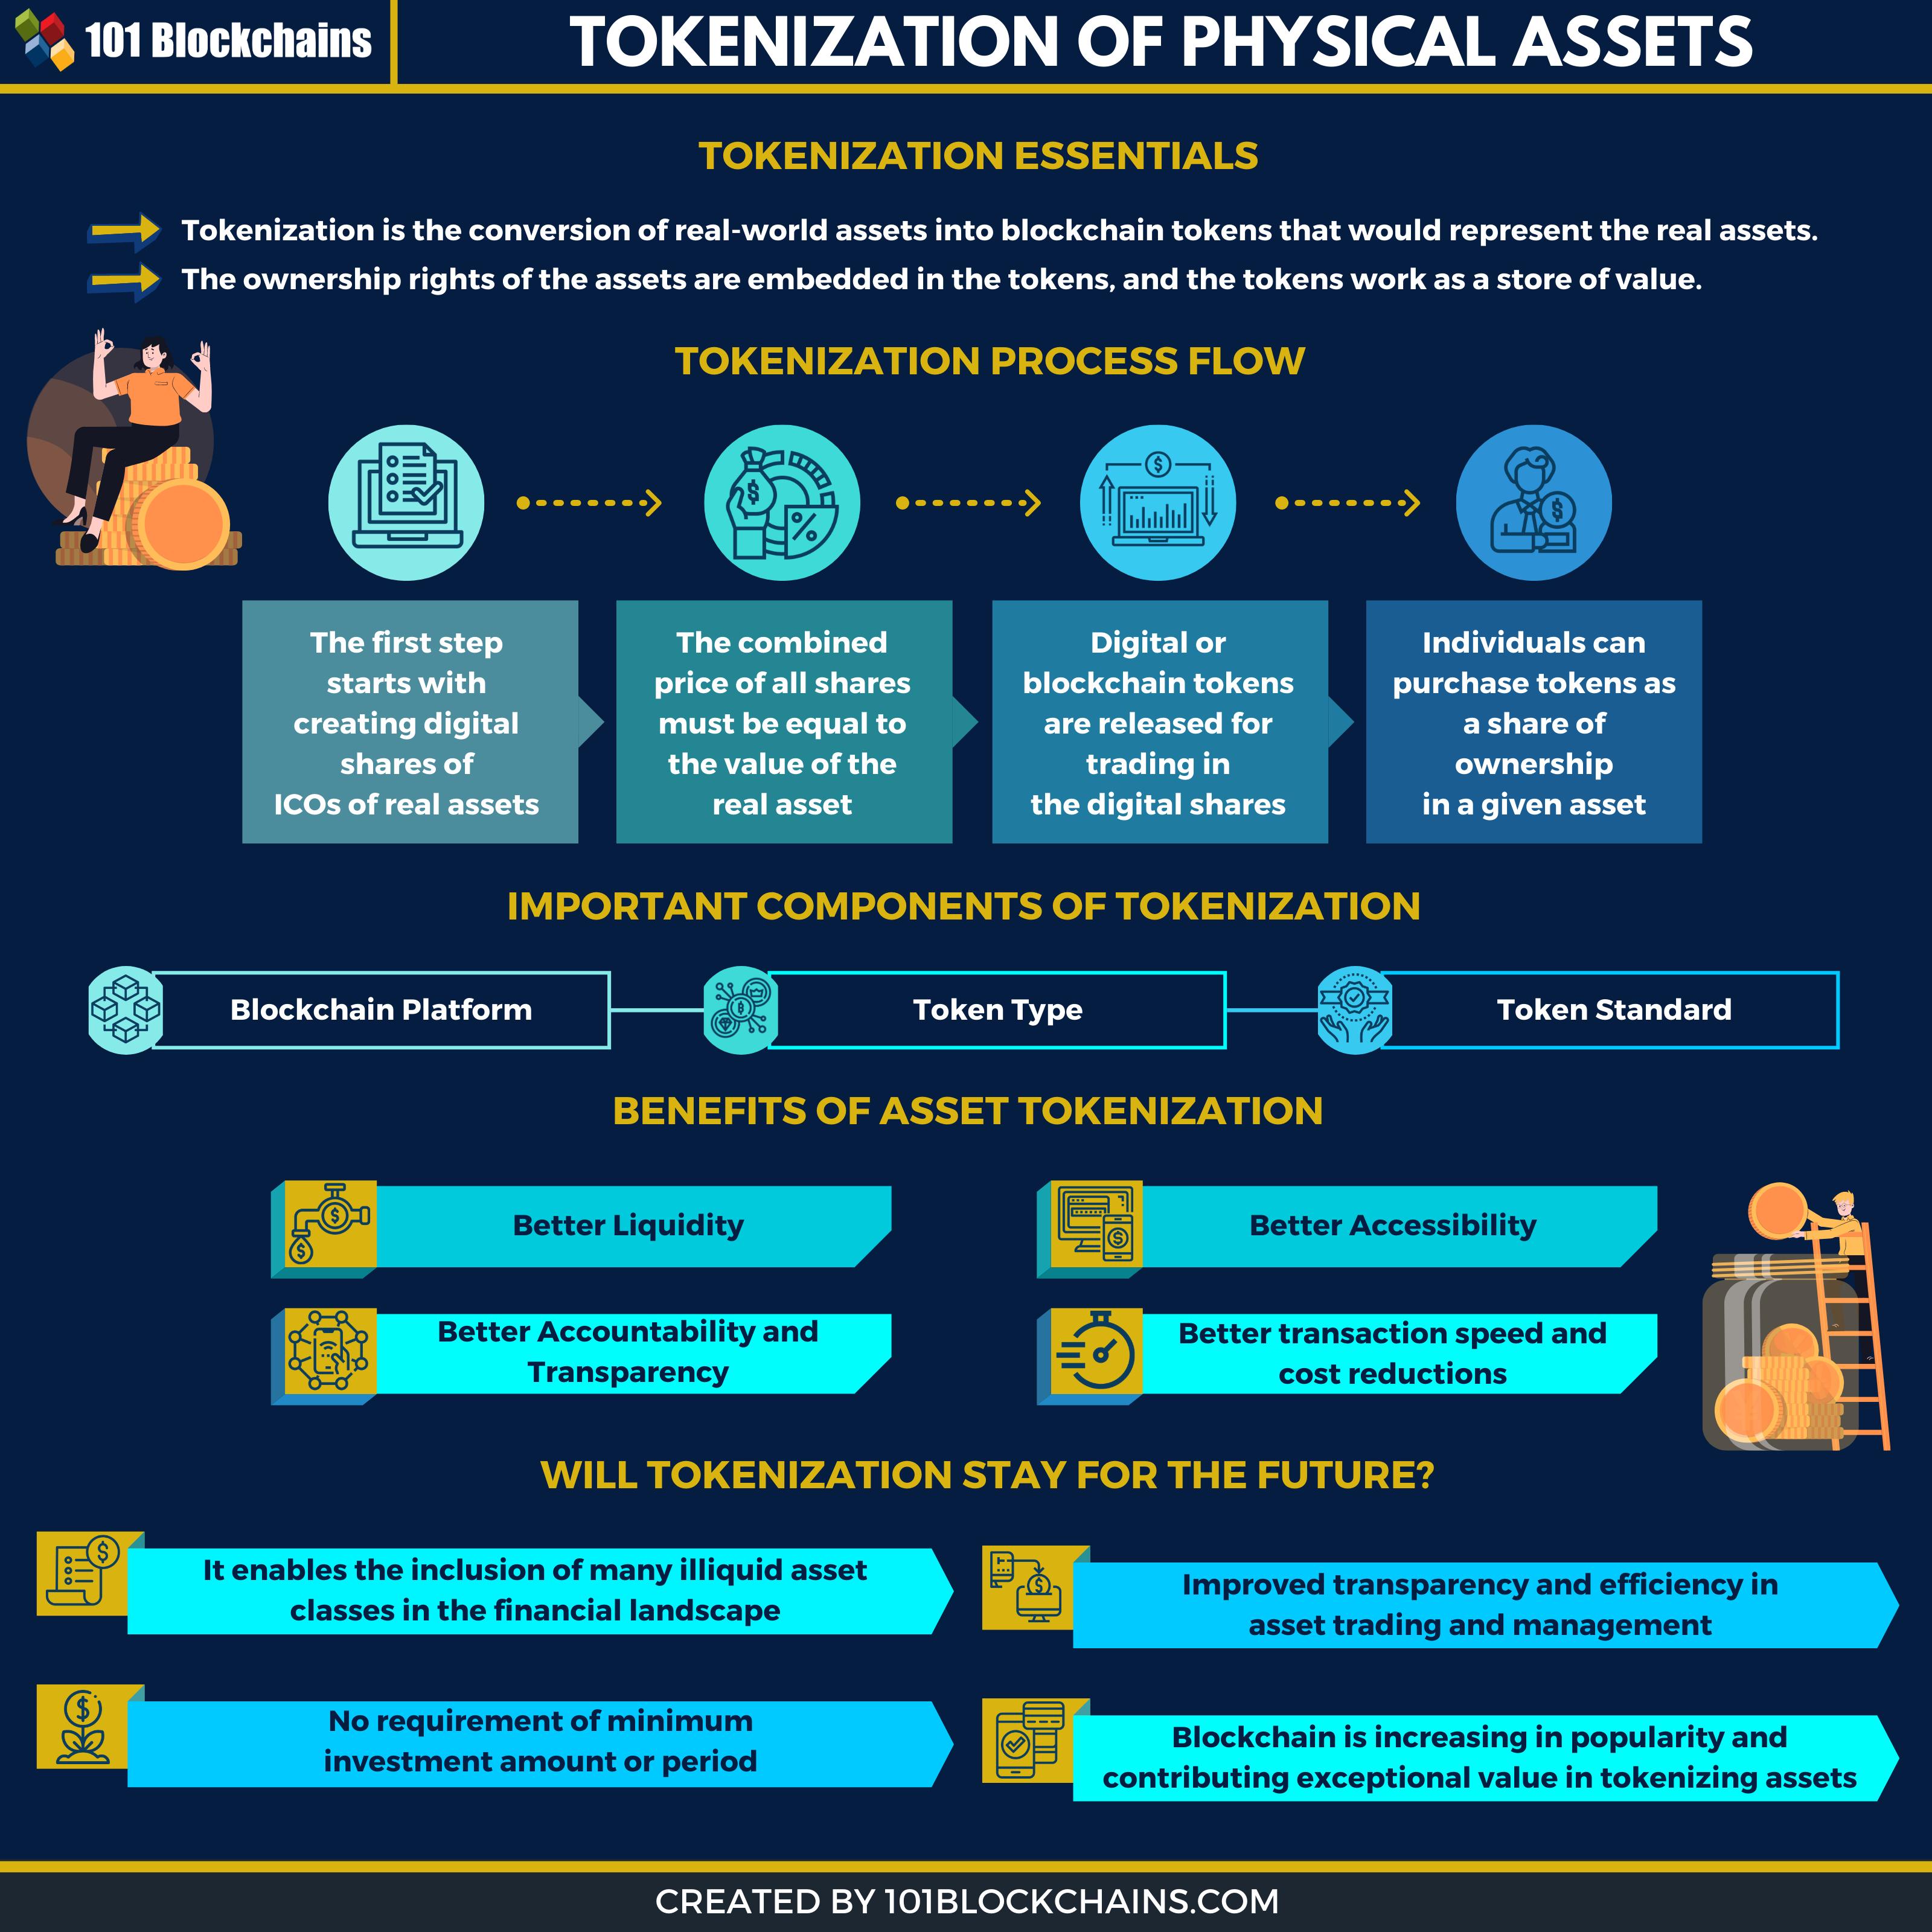 benefits of asset tokenization